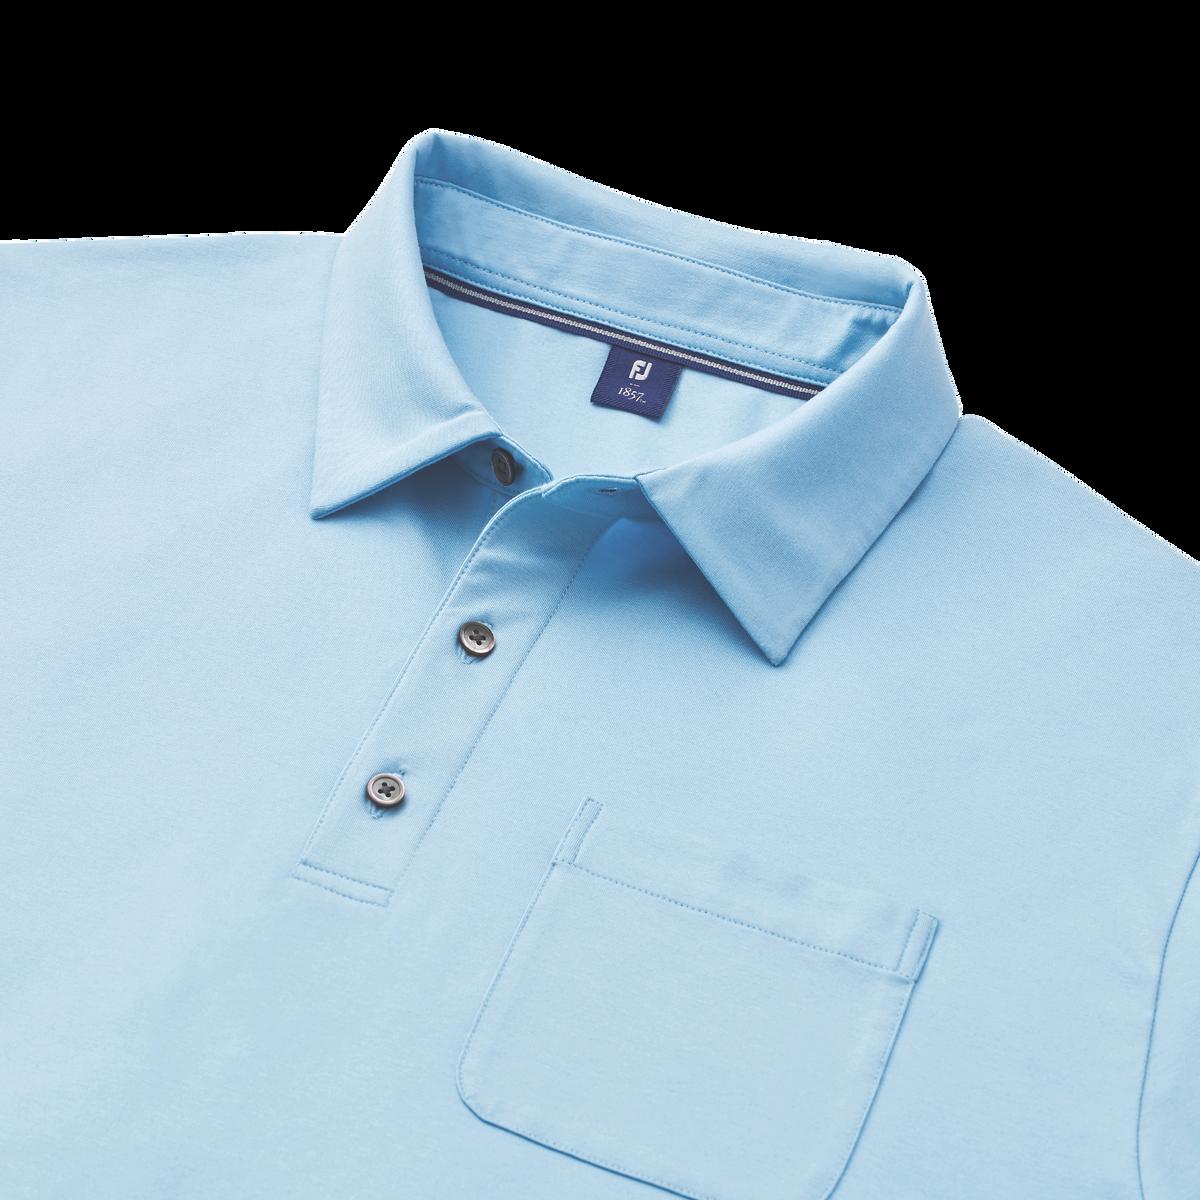 Supima Cotton Knit Shirt with Pocket